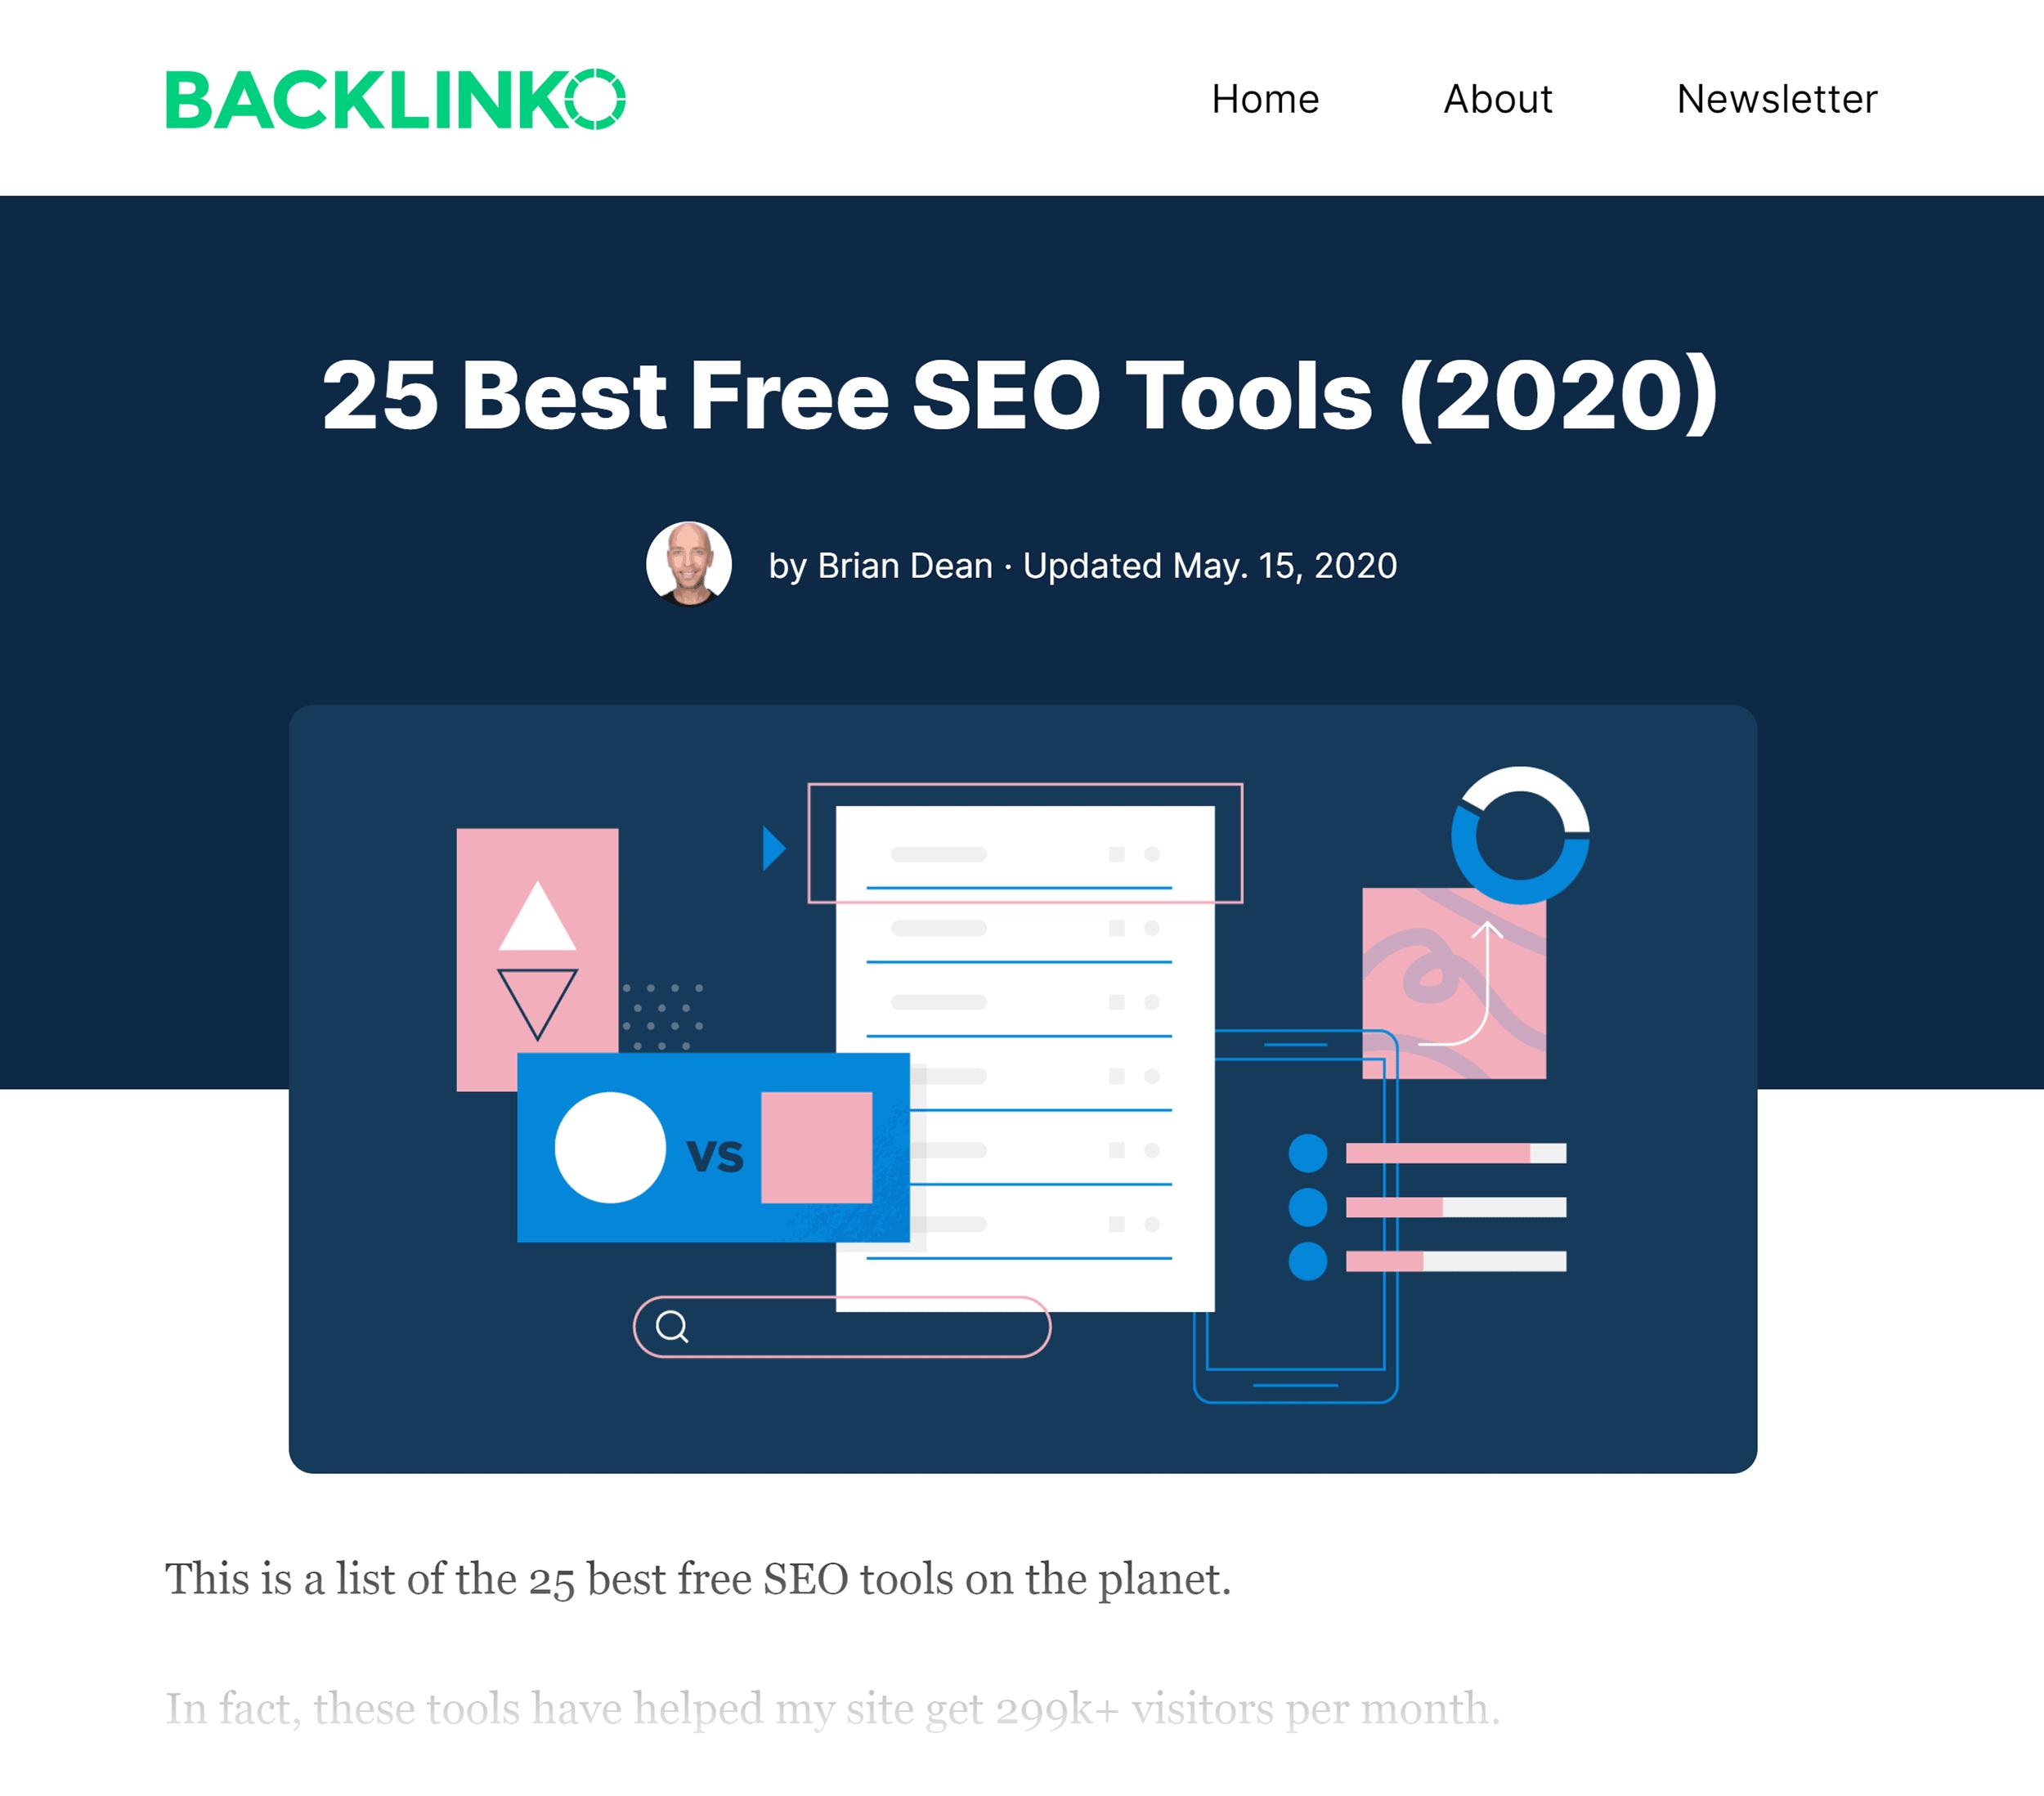 Backlinko – Best Free SEO Tools Post